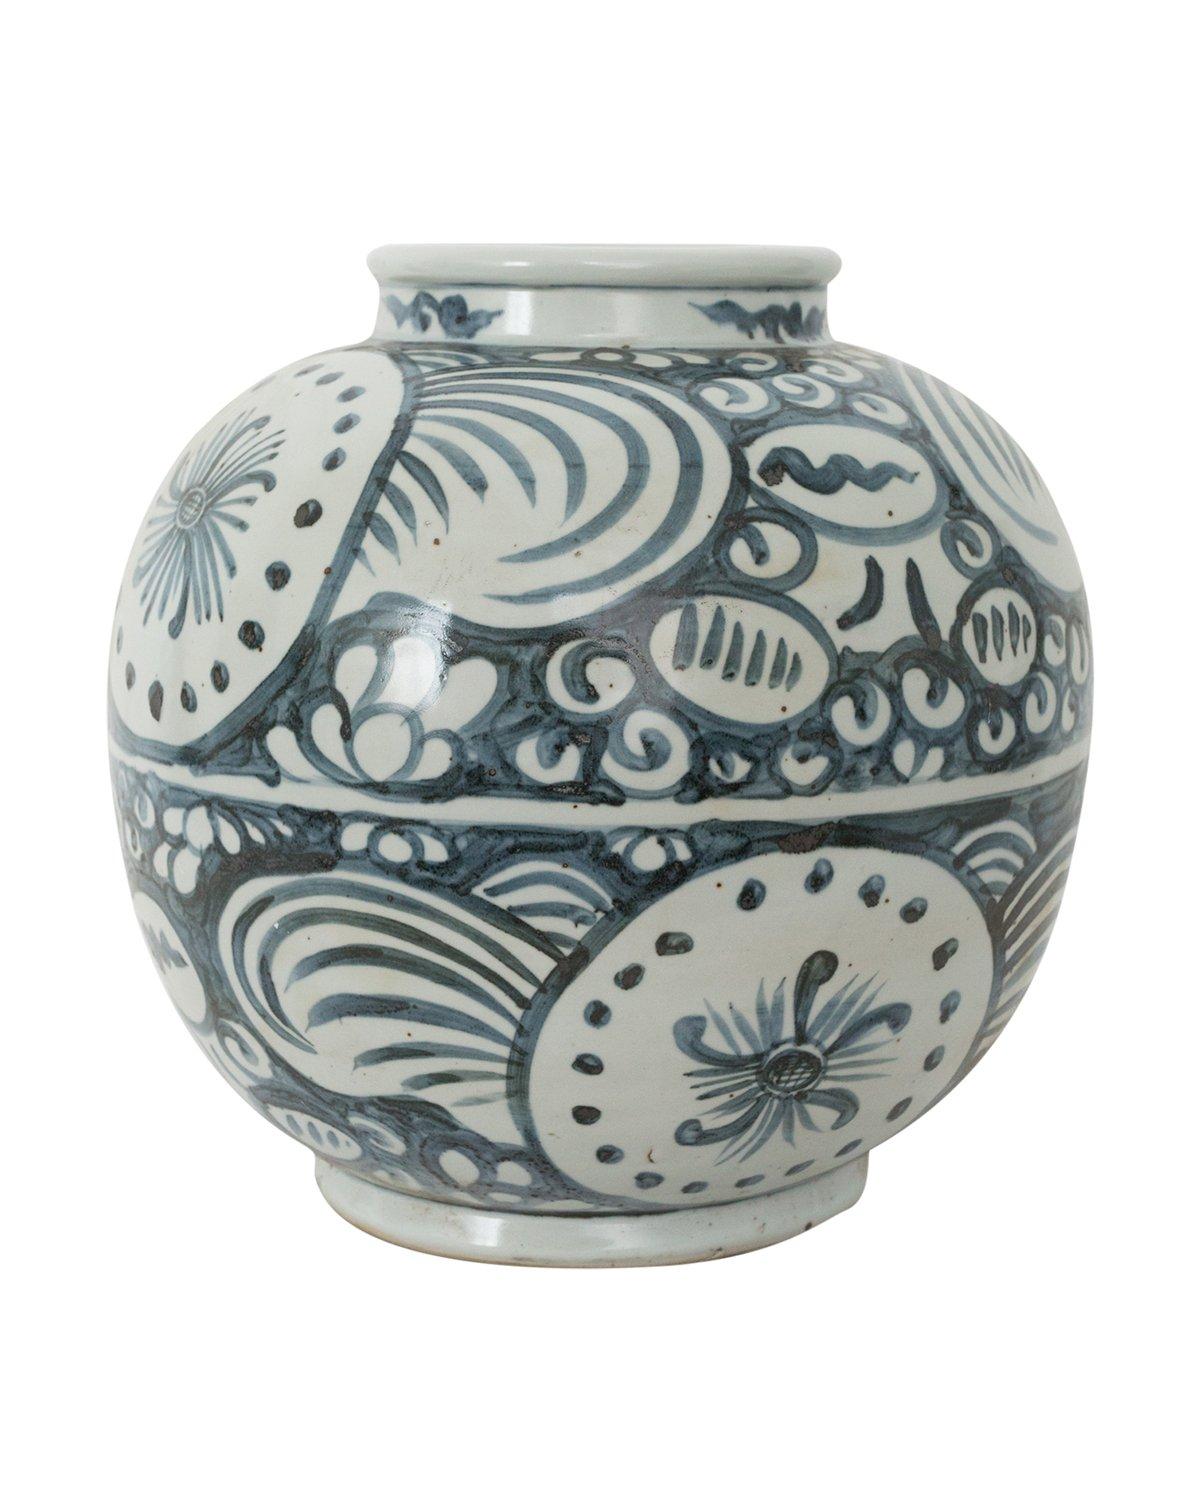 Yuan_Porcelain_Jar.jpg